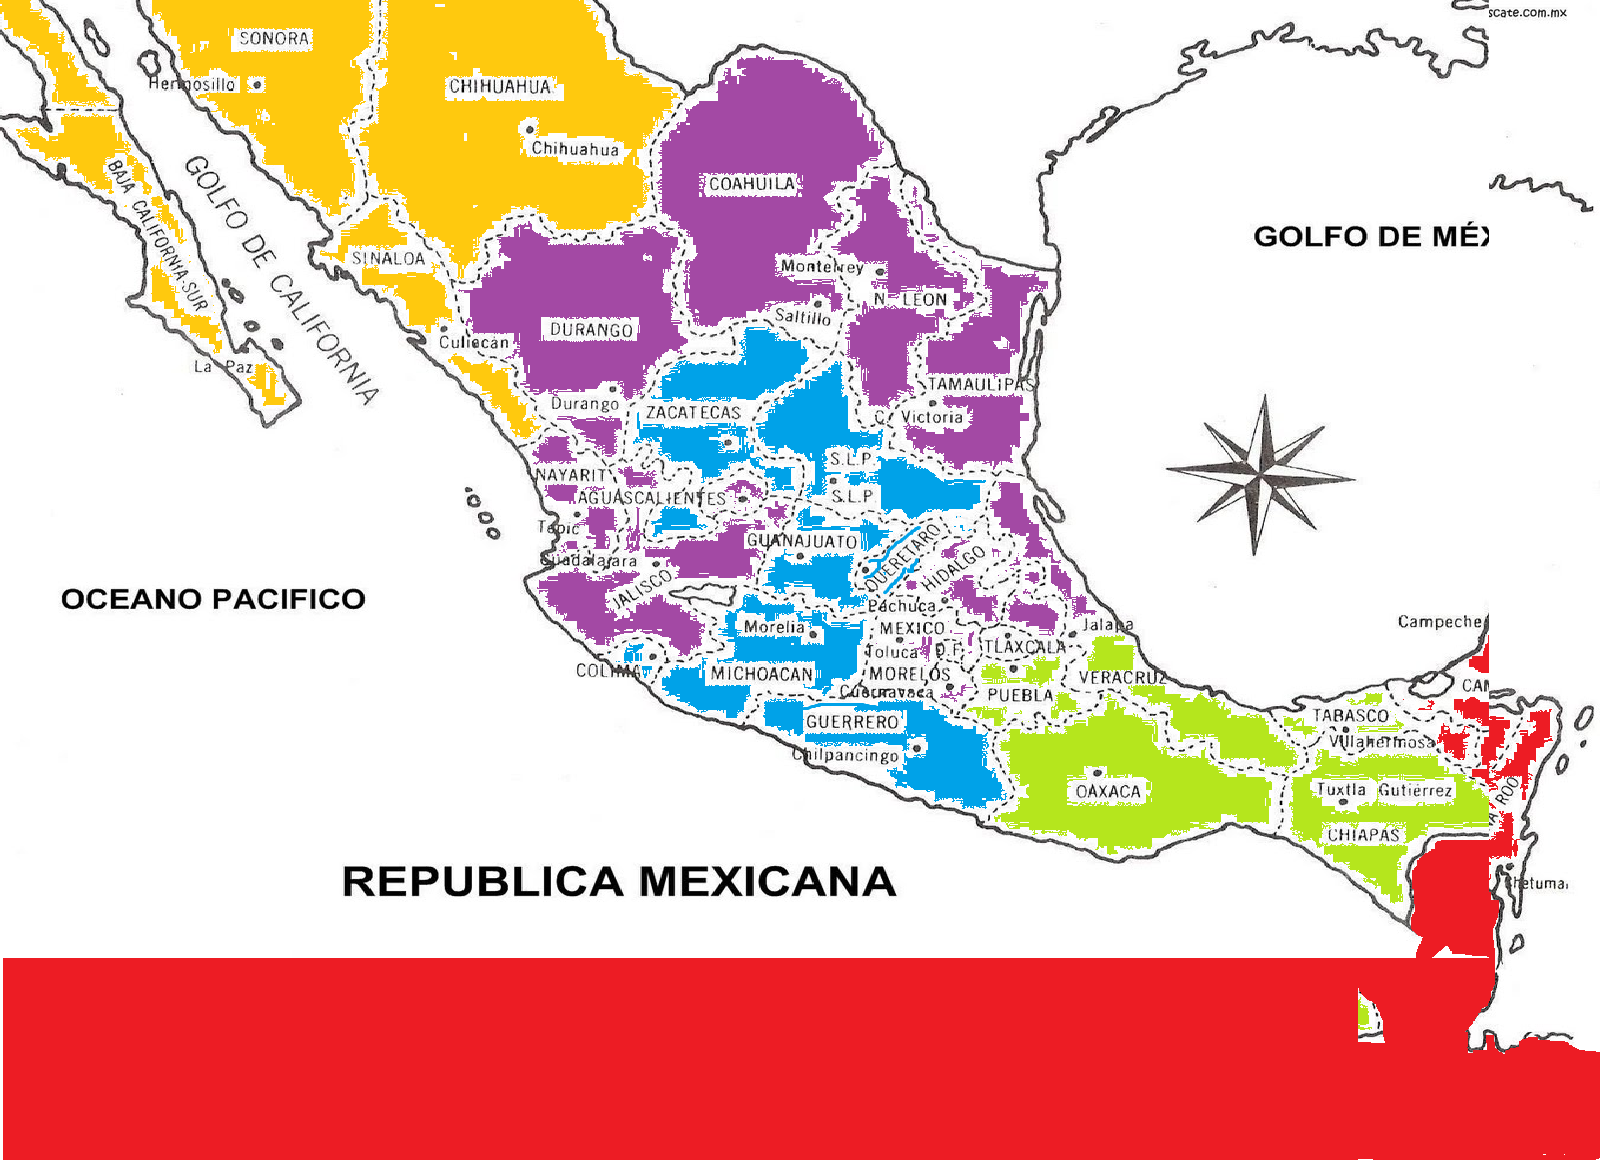 yesenia alejandra  lahistoriatec21 mapa de la republica mexicana